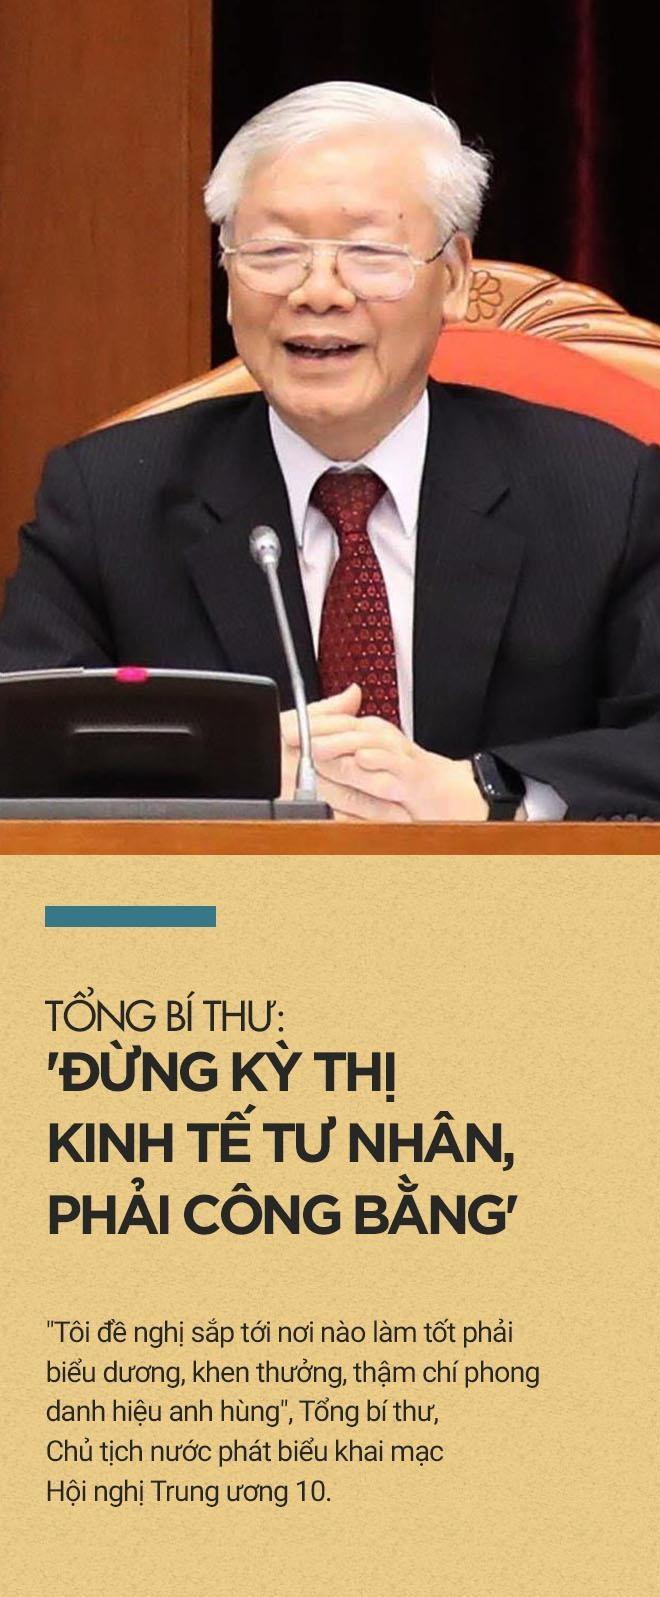 Tong bi thu: 'Dung ky thi kinh te tu nhan, phai cong bang' hinh anh 1